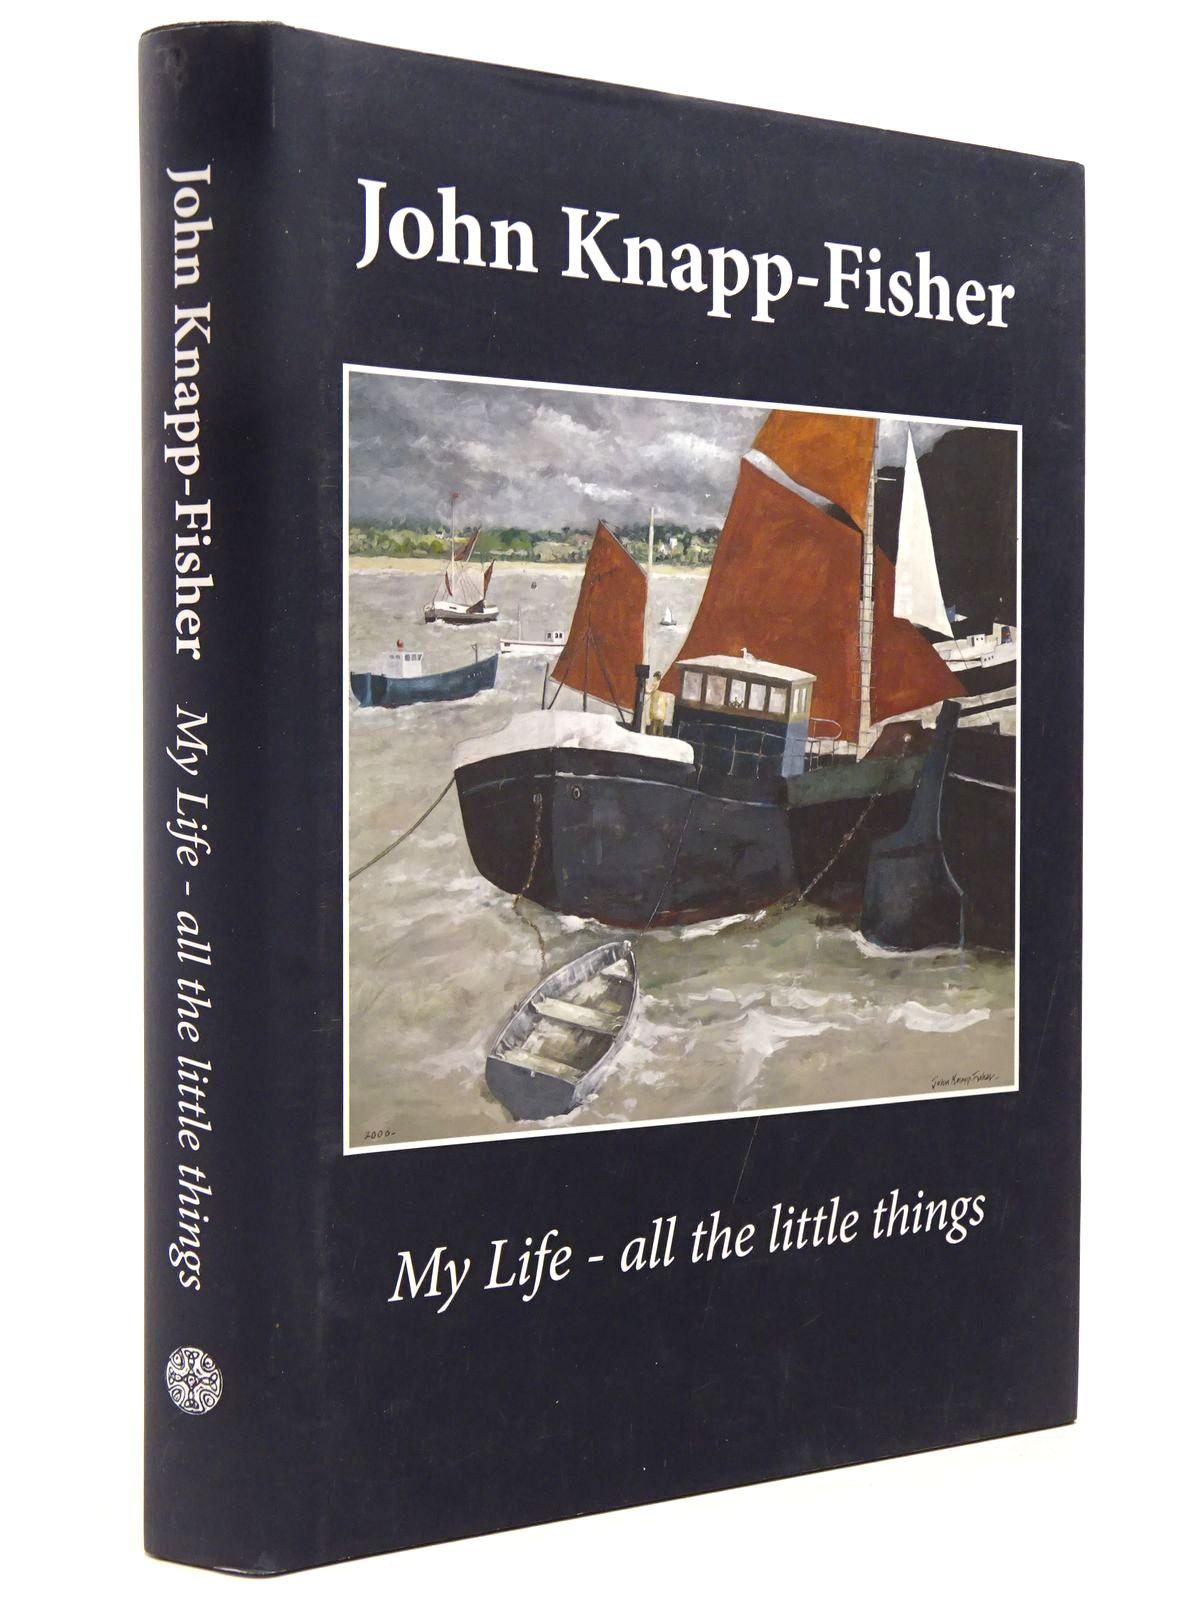 Photo of JOHN KNAPP-FISHER MY LIFE - ALL THE LITTLE THINGS written by Knapp-Fisher, John illustrated by Knapp-Fisher, John published by The Senecio Press (STOCK CODE: 2129591)  for sale by Stella & Rose's Books